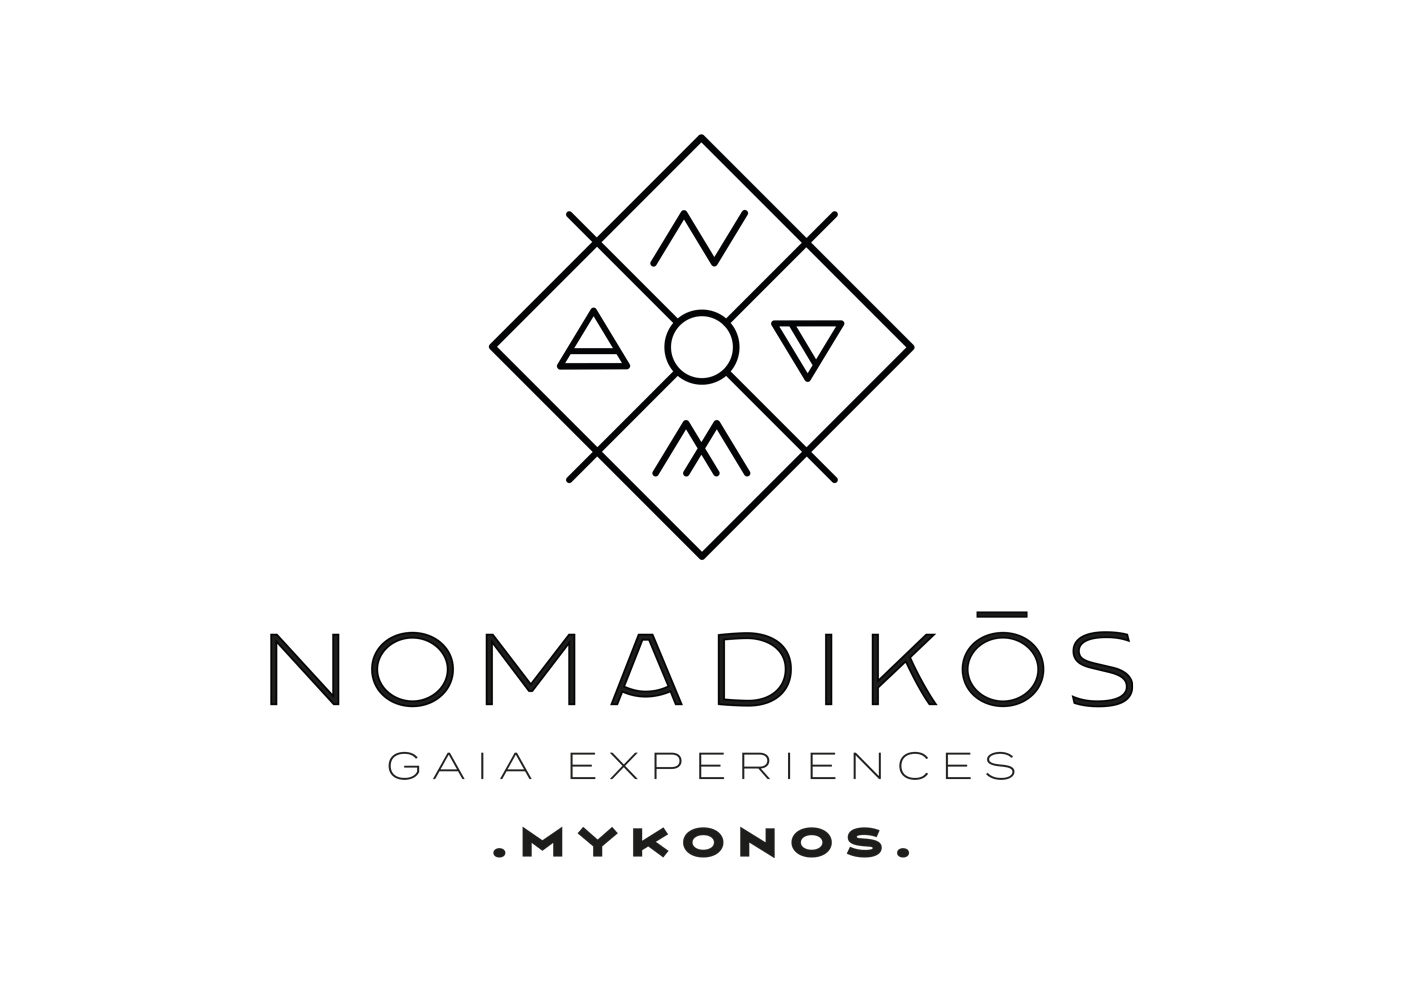 nomadikos_concept3.jpg